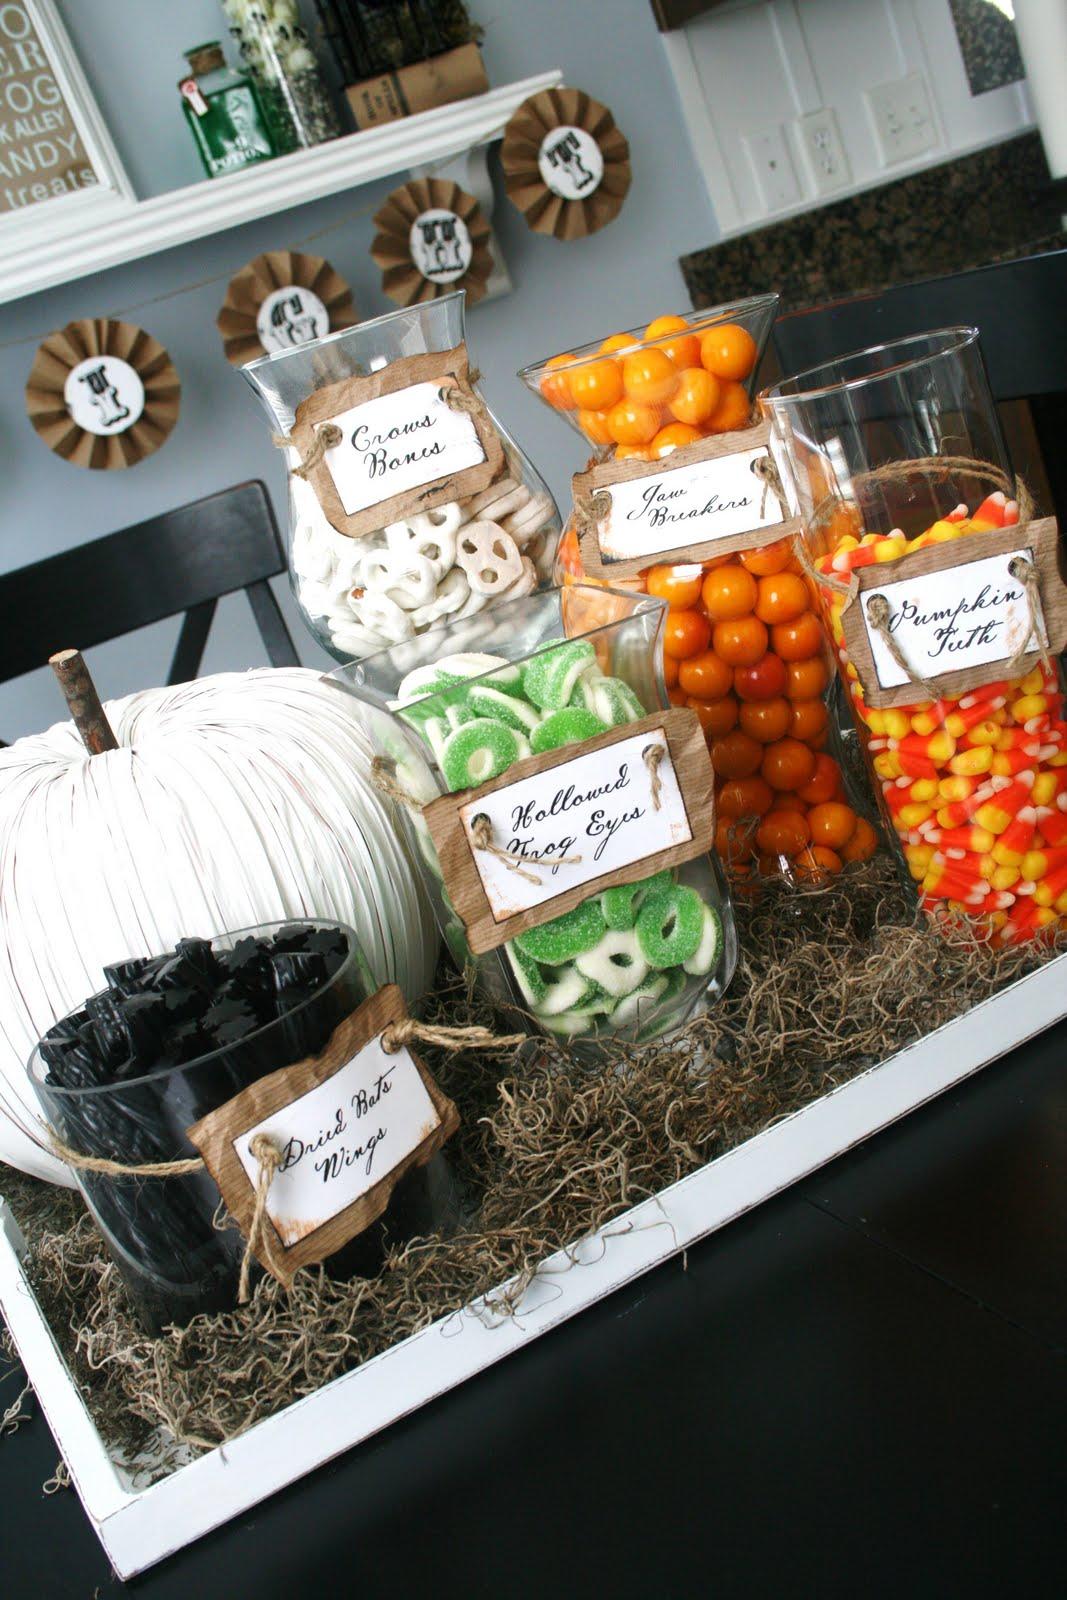 Copy Cat Crafts Halloween Displays